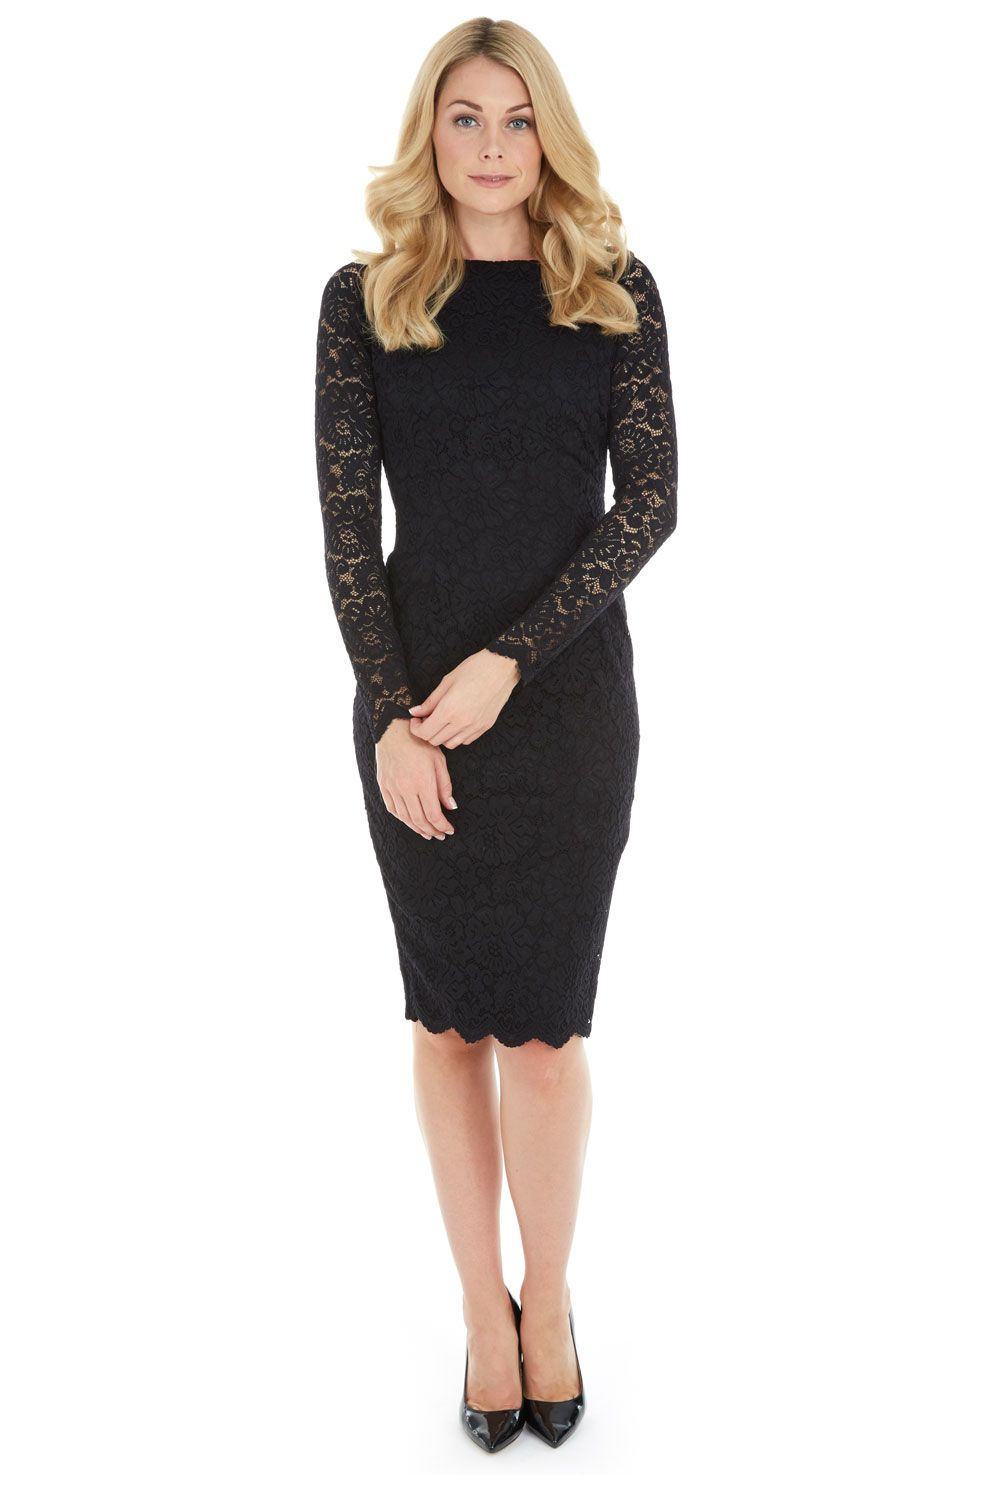 Blake Black Luxury Lace Pencil Dress - view 1   pin-up   Pinterest ...